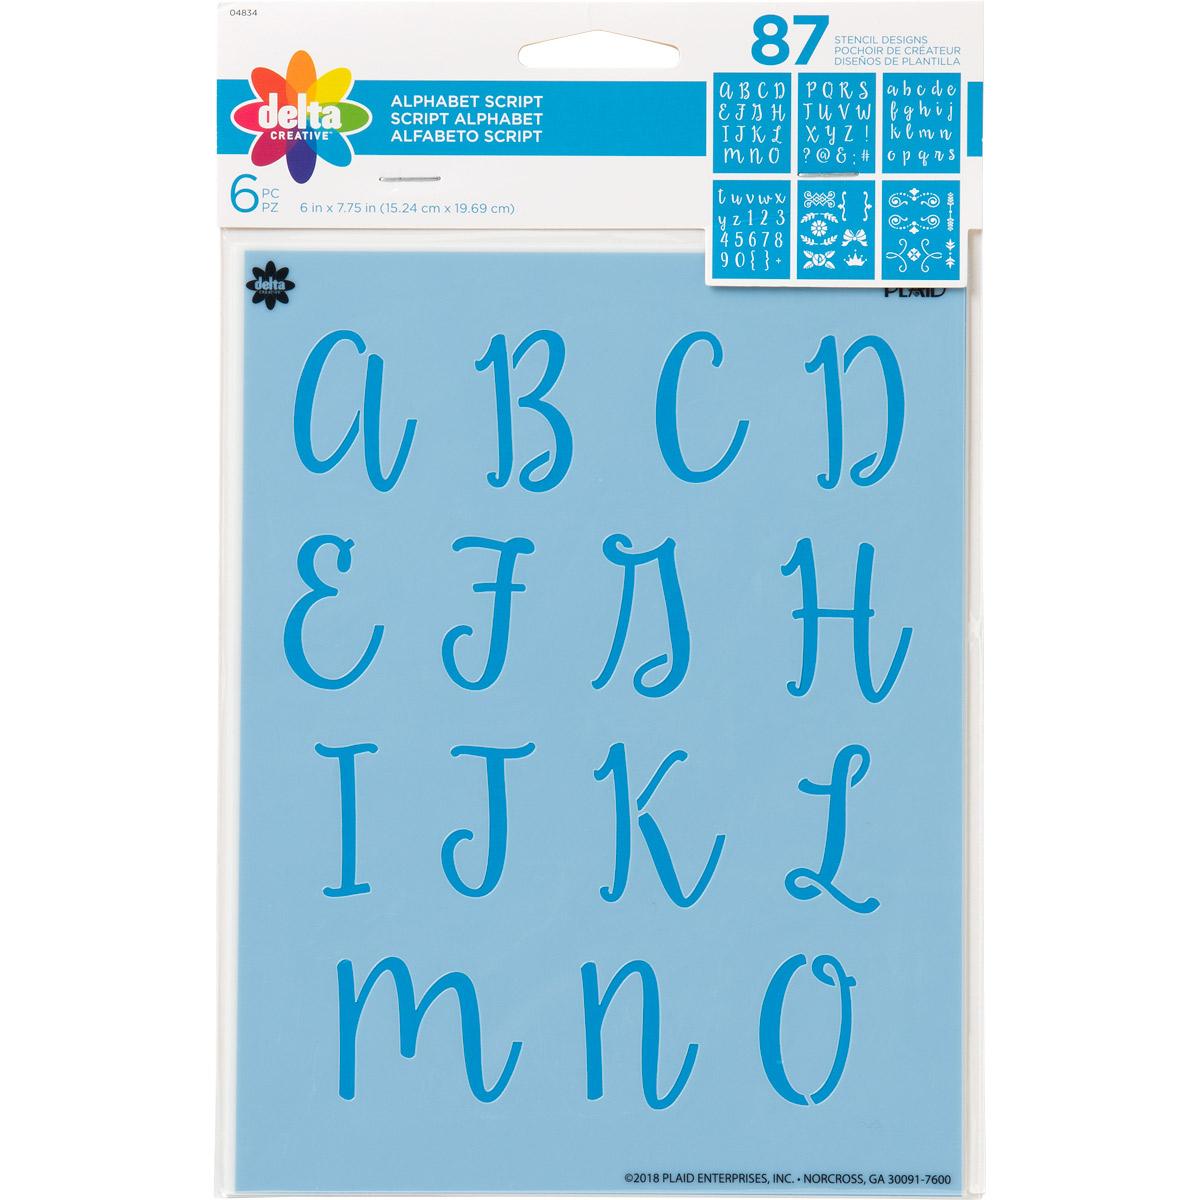 Delta Creative™ Stencil - Alphabet Script - 04834